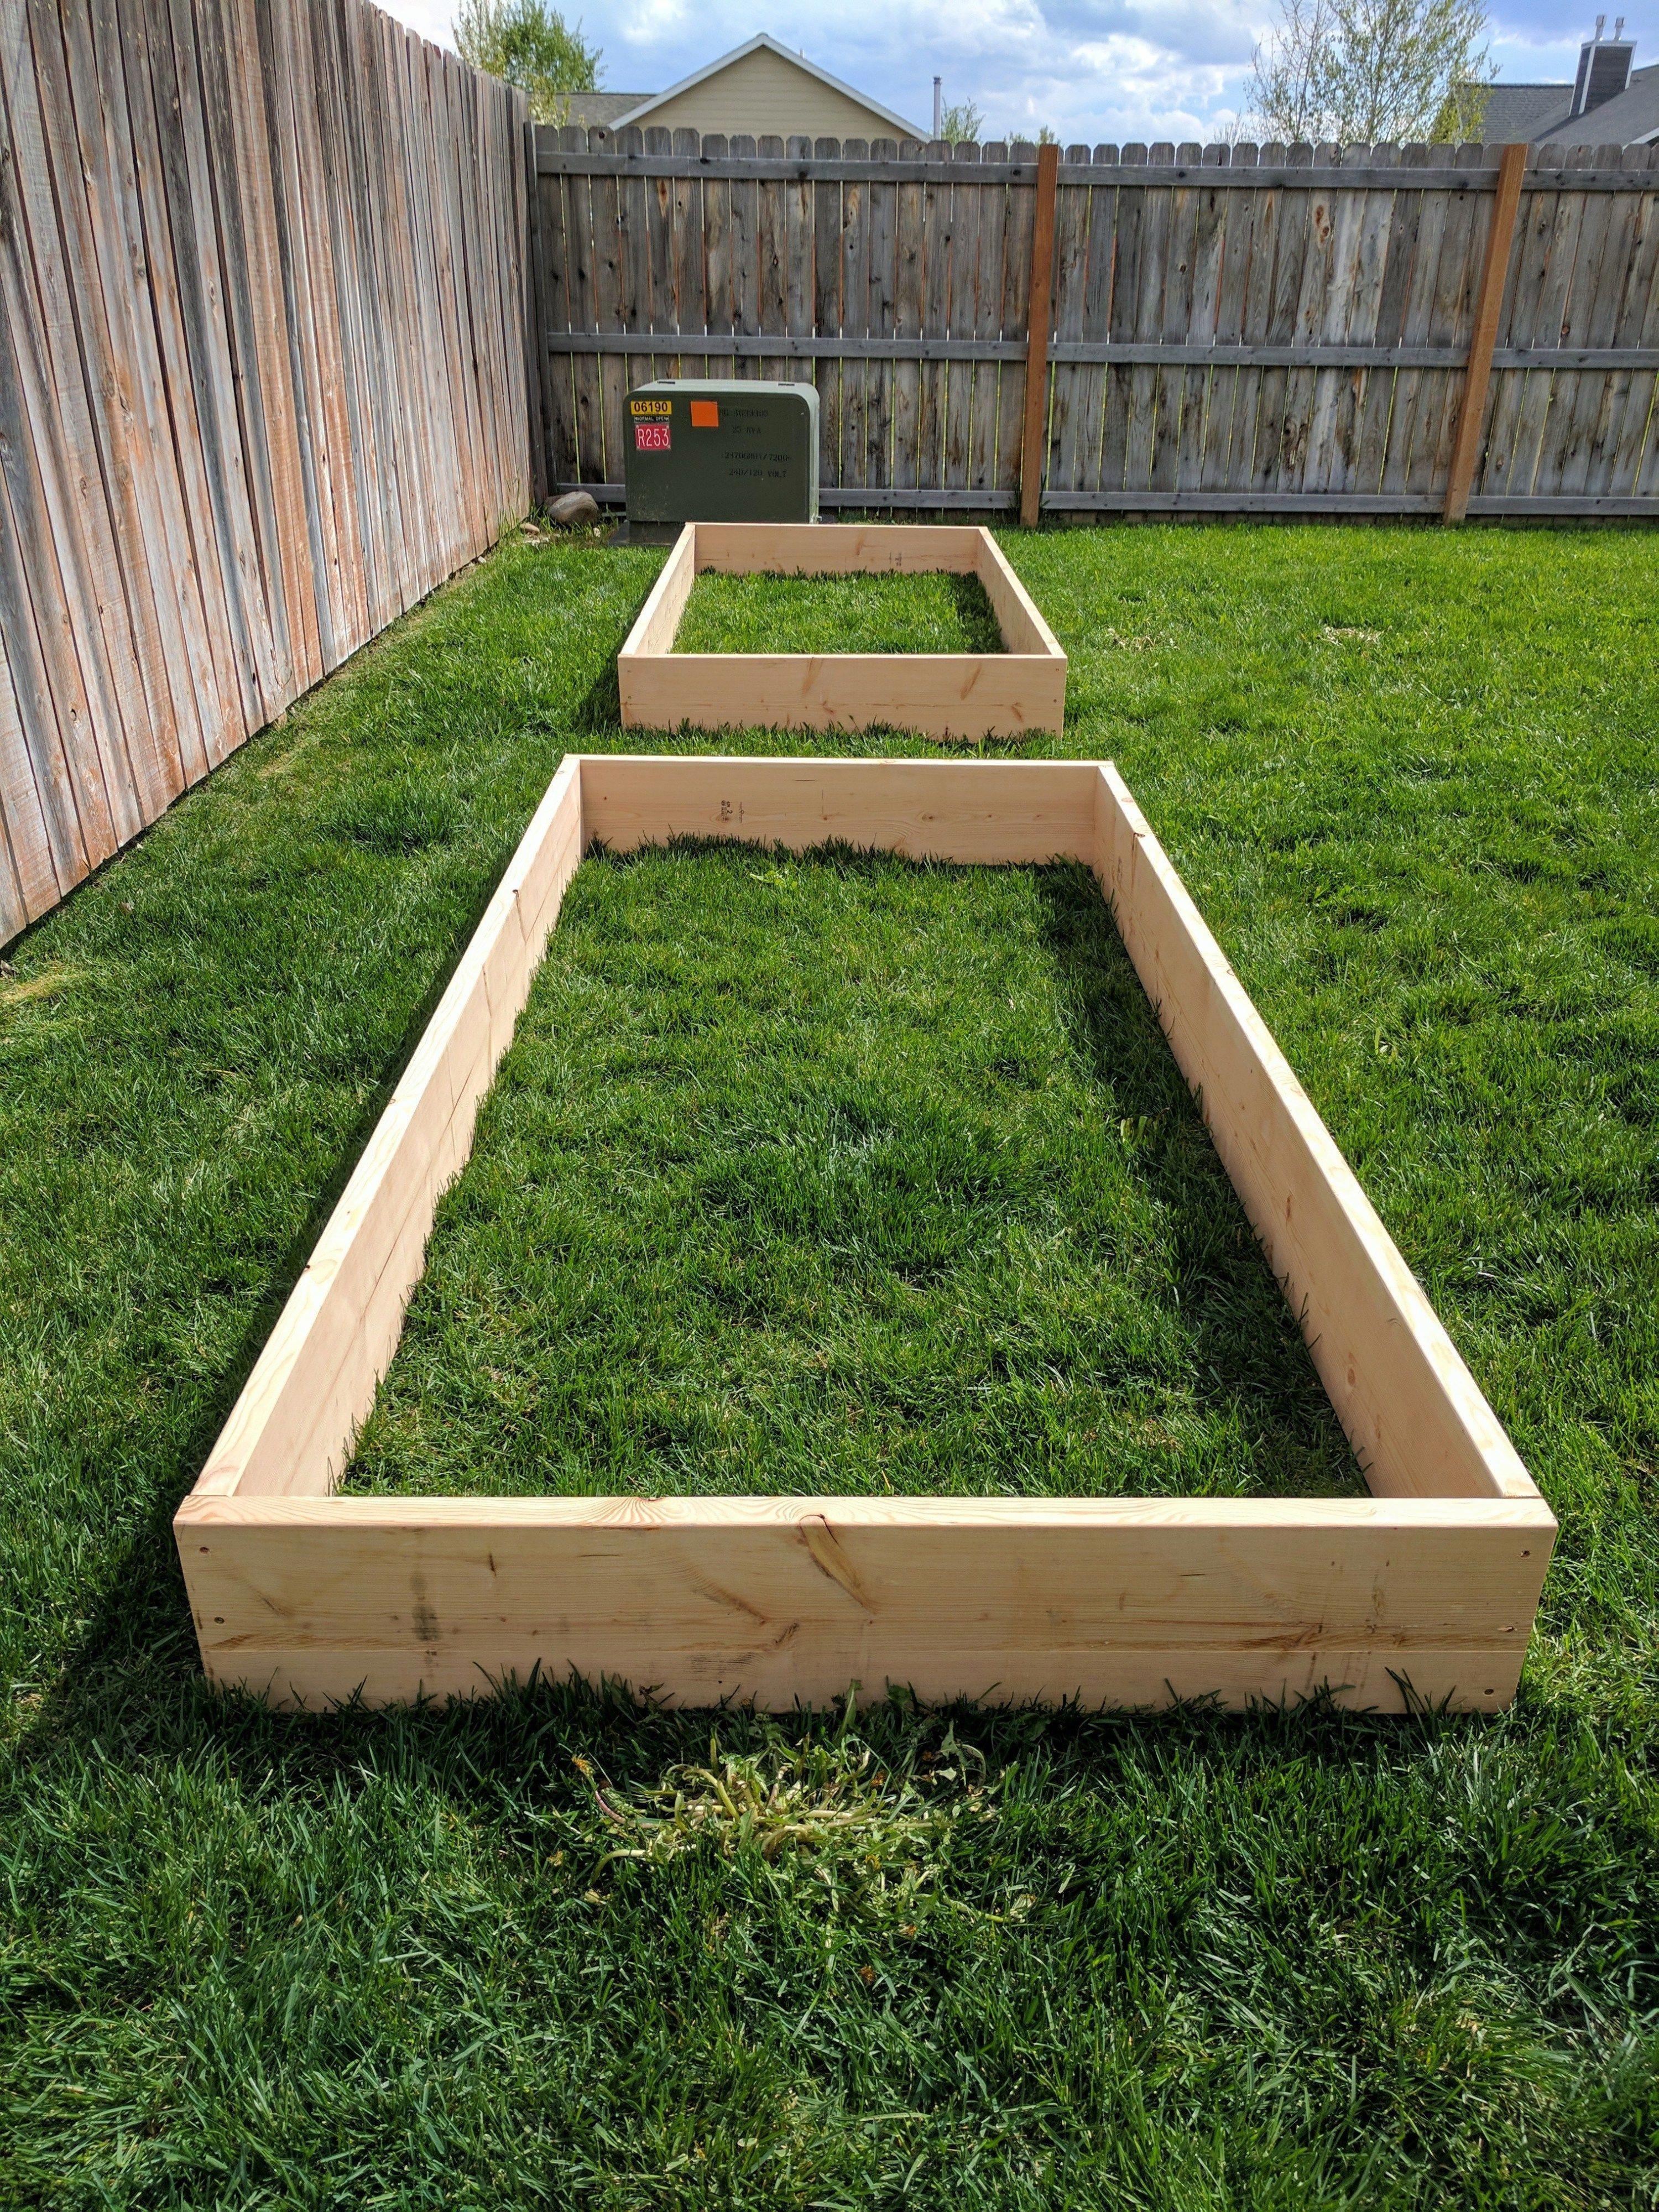 Garden bed with trees  DIY Raised Garden Beds  Planting a garden soon Follow this guide